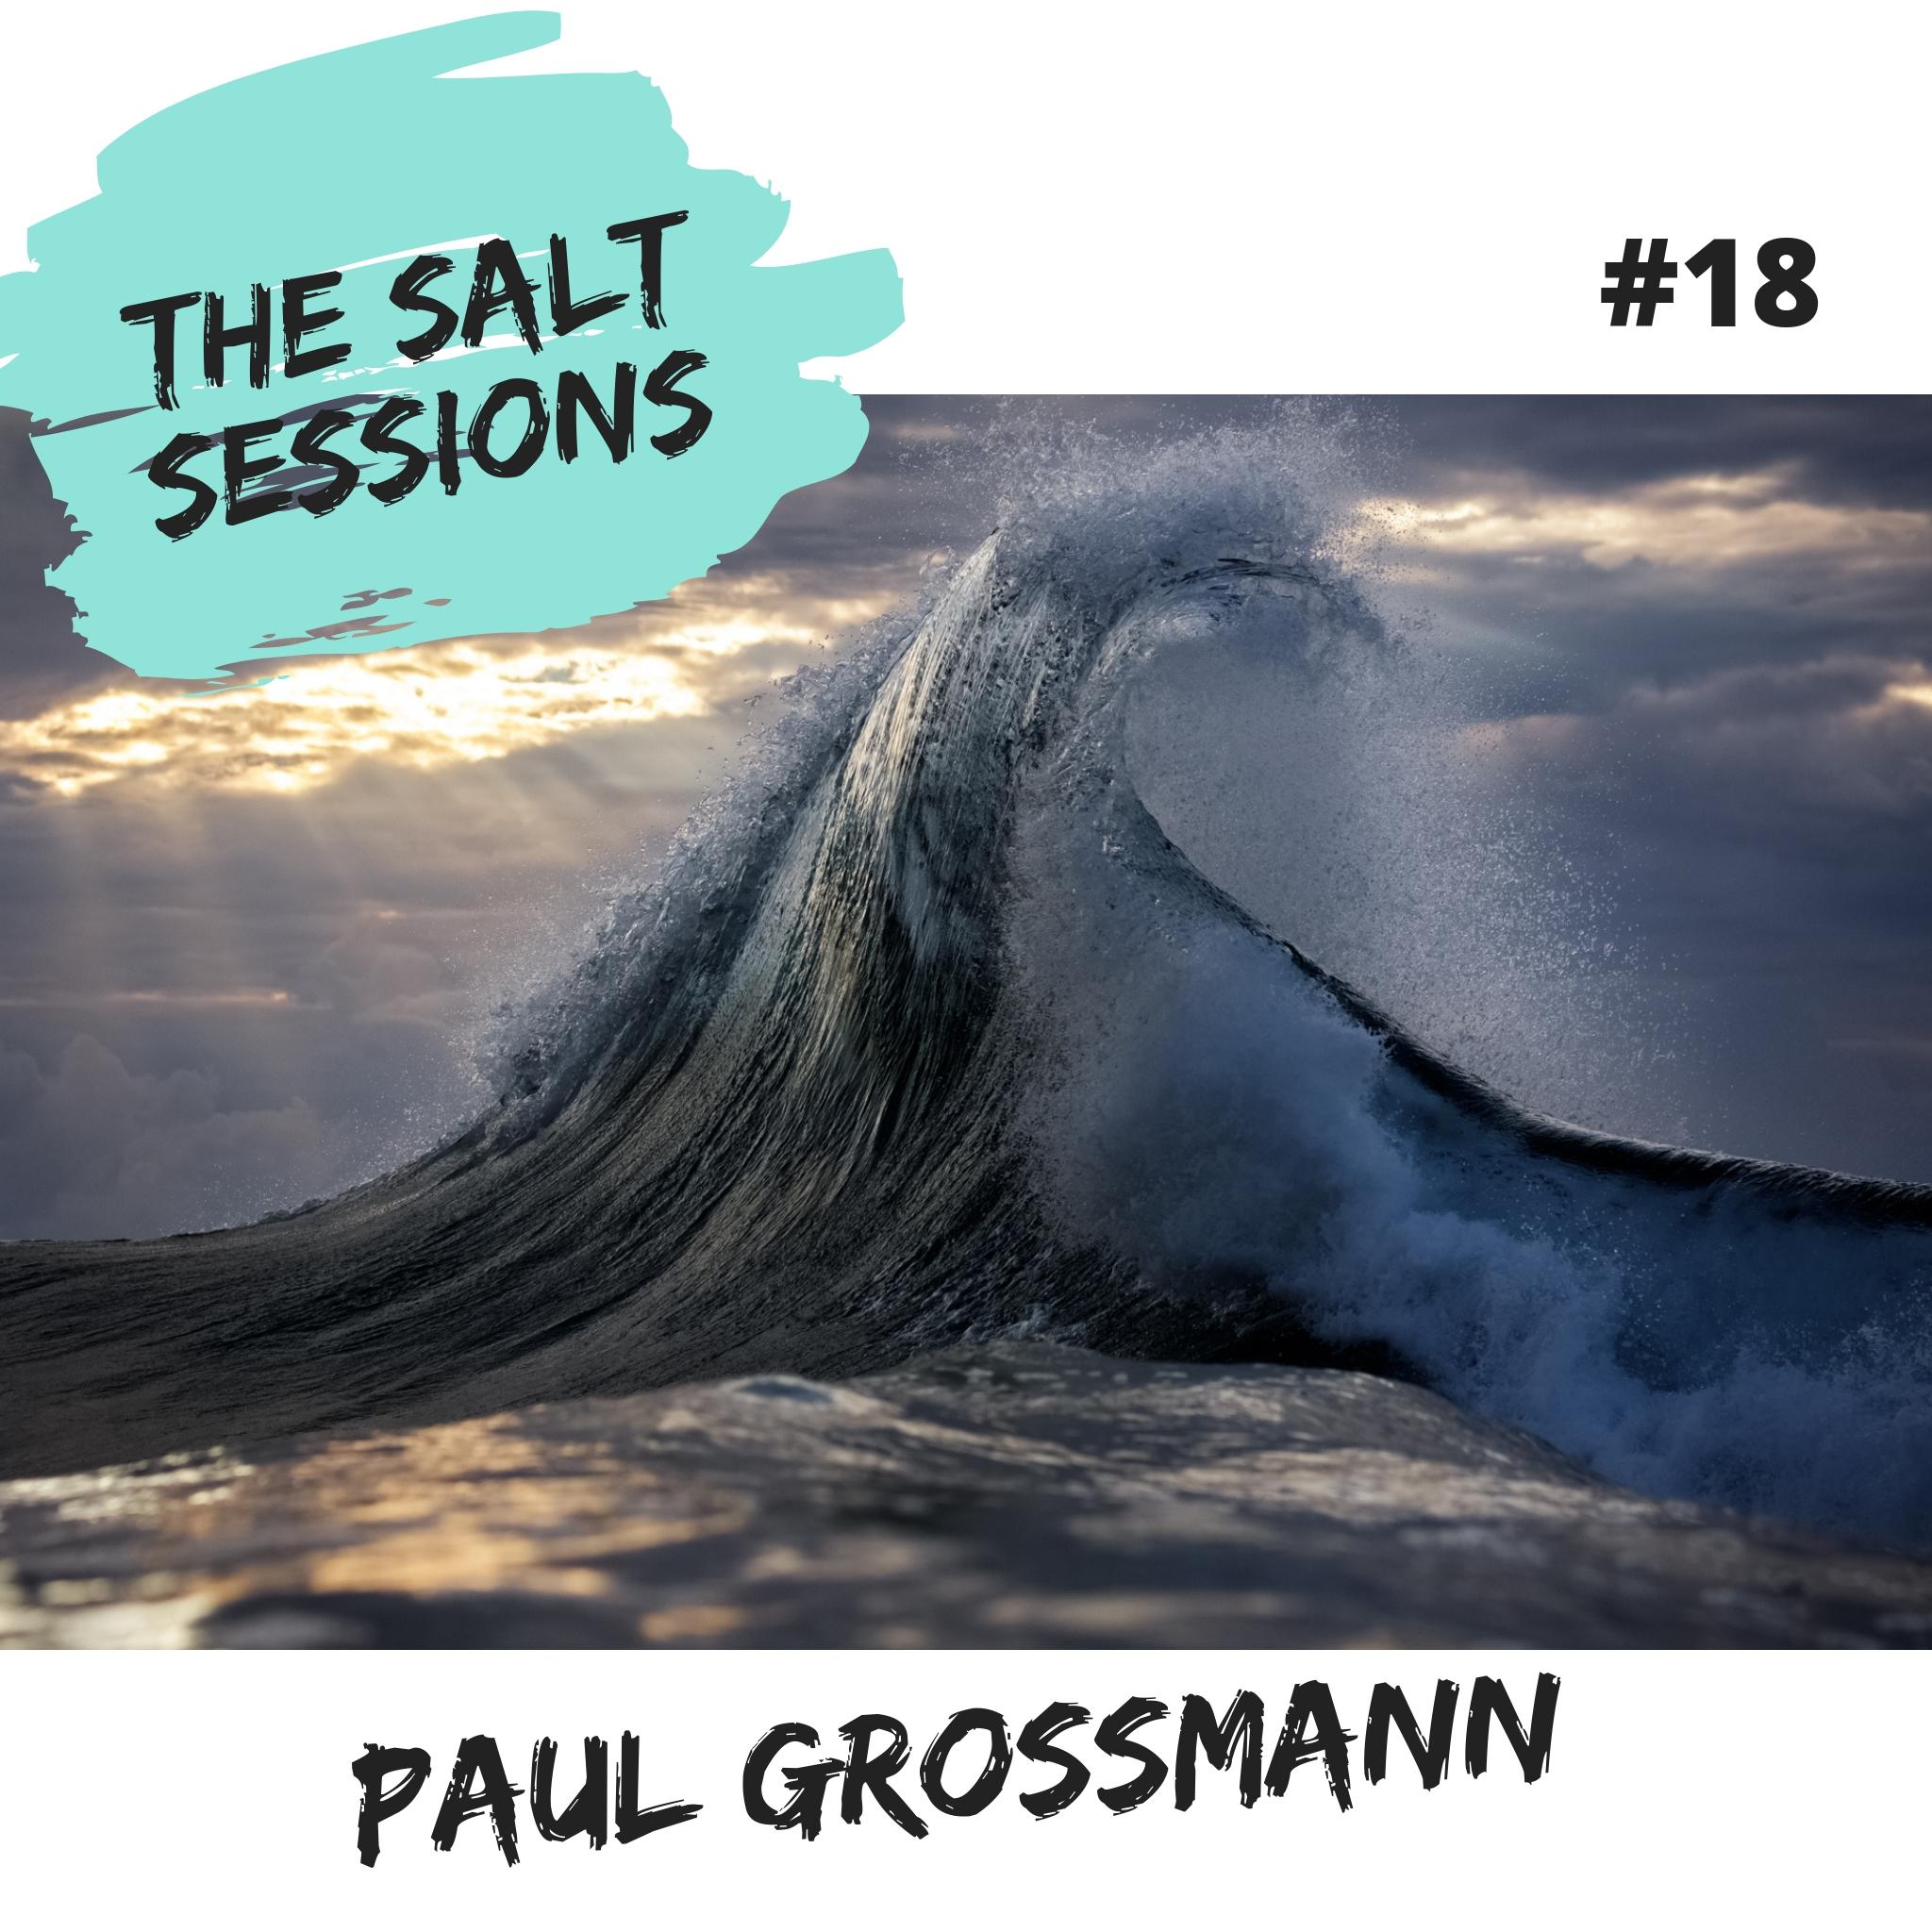 PAUL_GROSSMANN_IG_POST.jpg